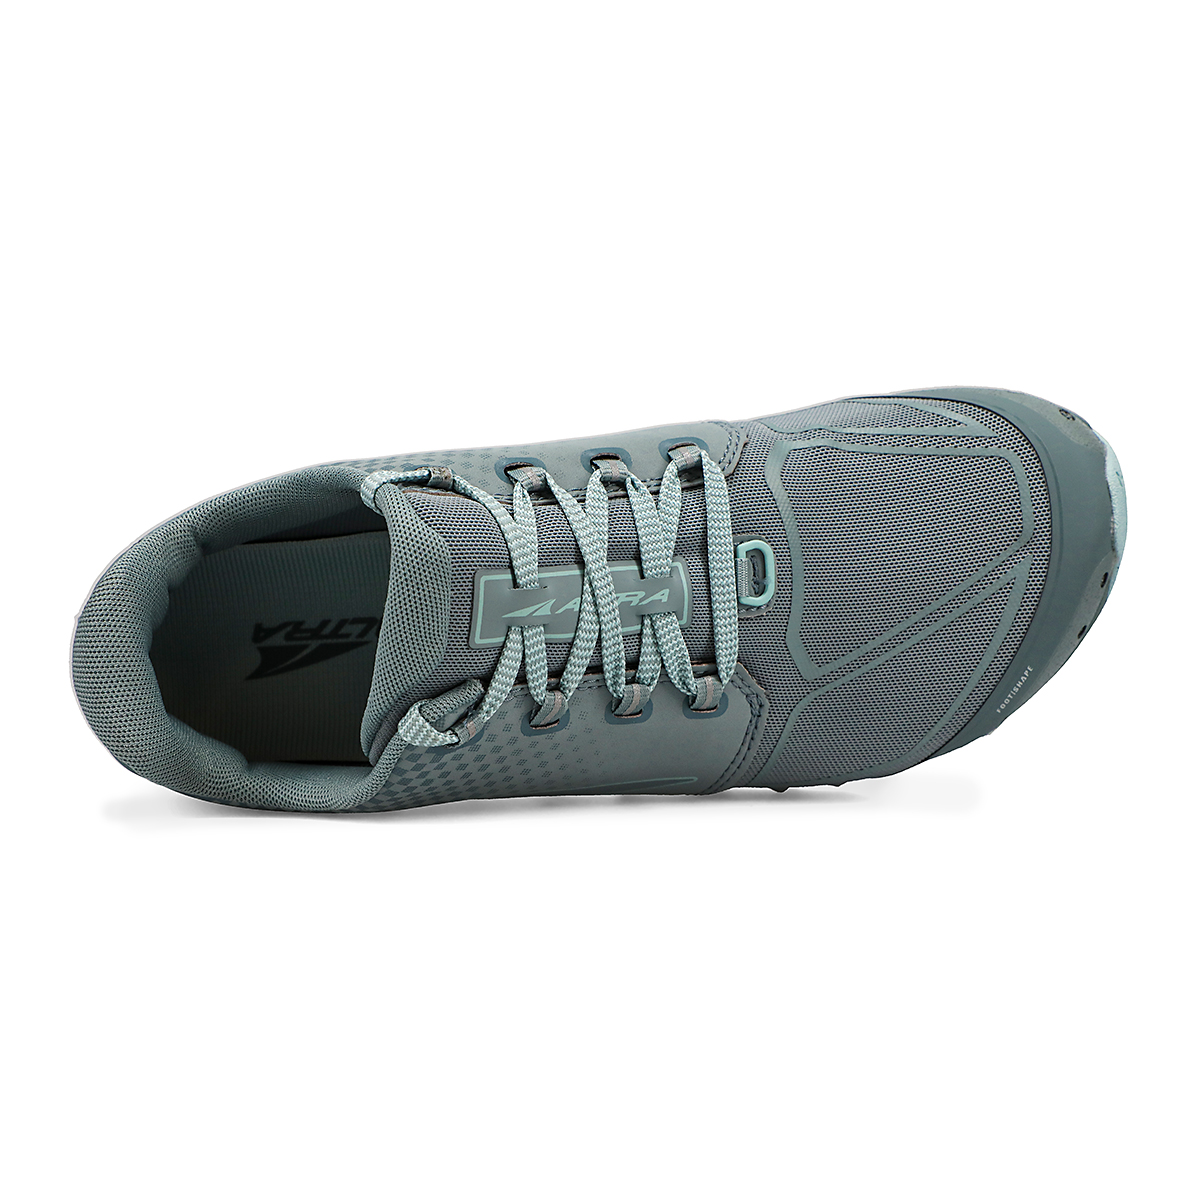 Women's Altra Superior 4.5 Trail Running Shoe - Color: Light Blue - Size: 5.5 - Width: Regular, Light Blue, large, image 4